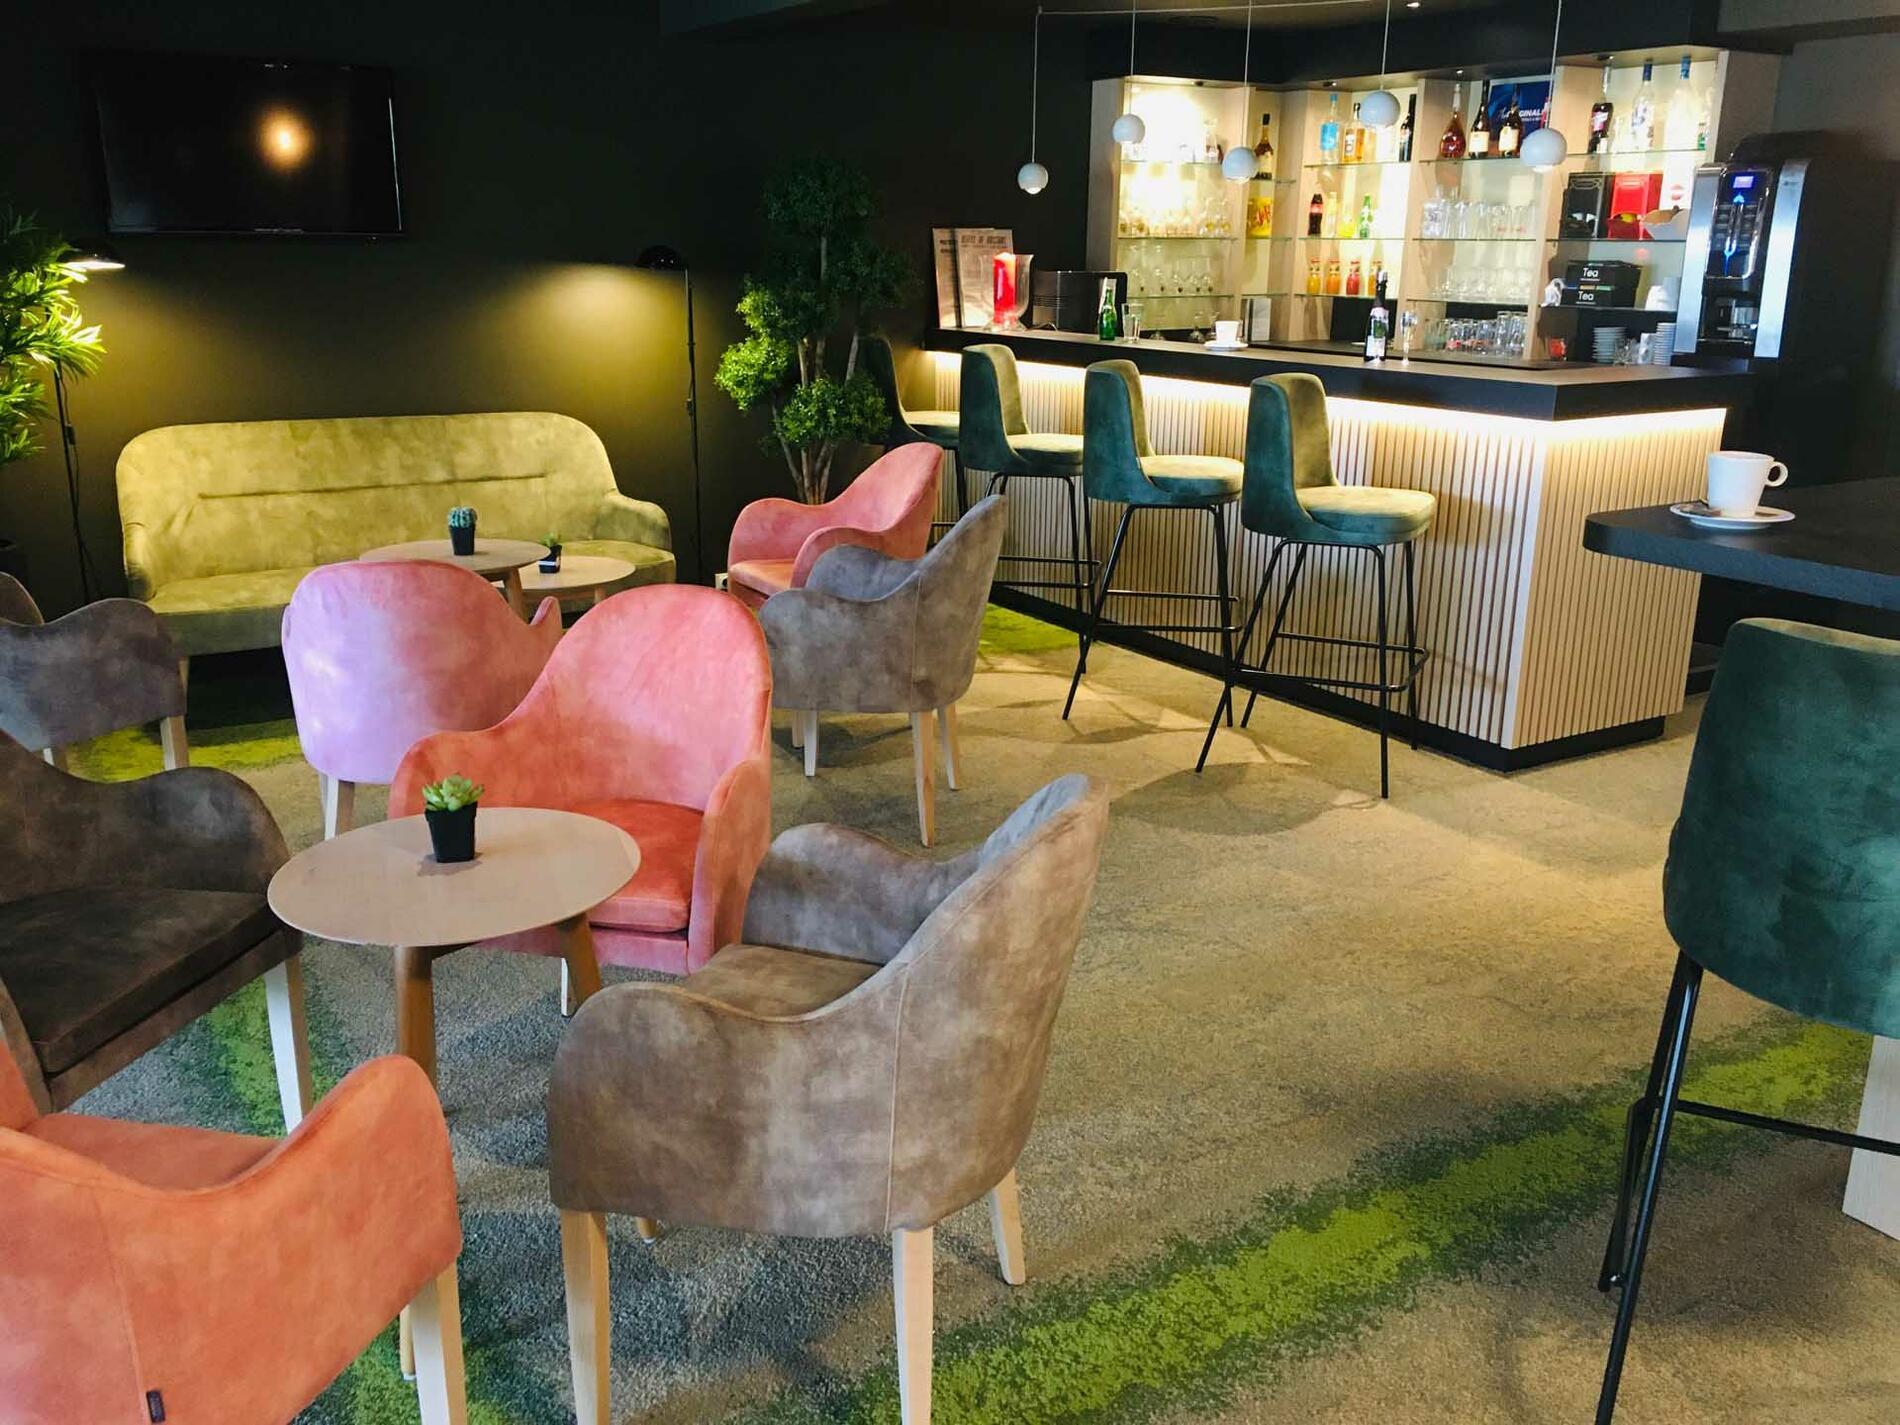 Bar at Acropole Hôtel